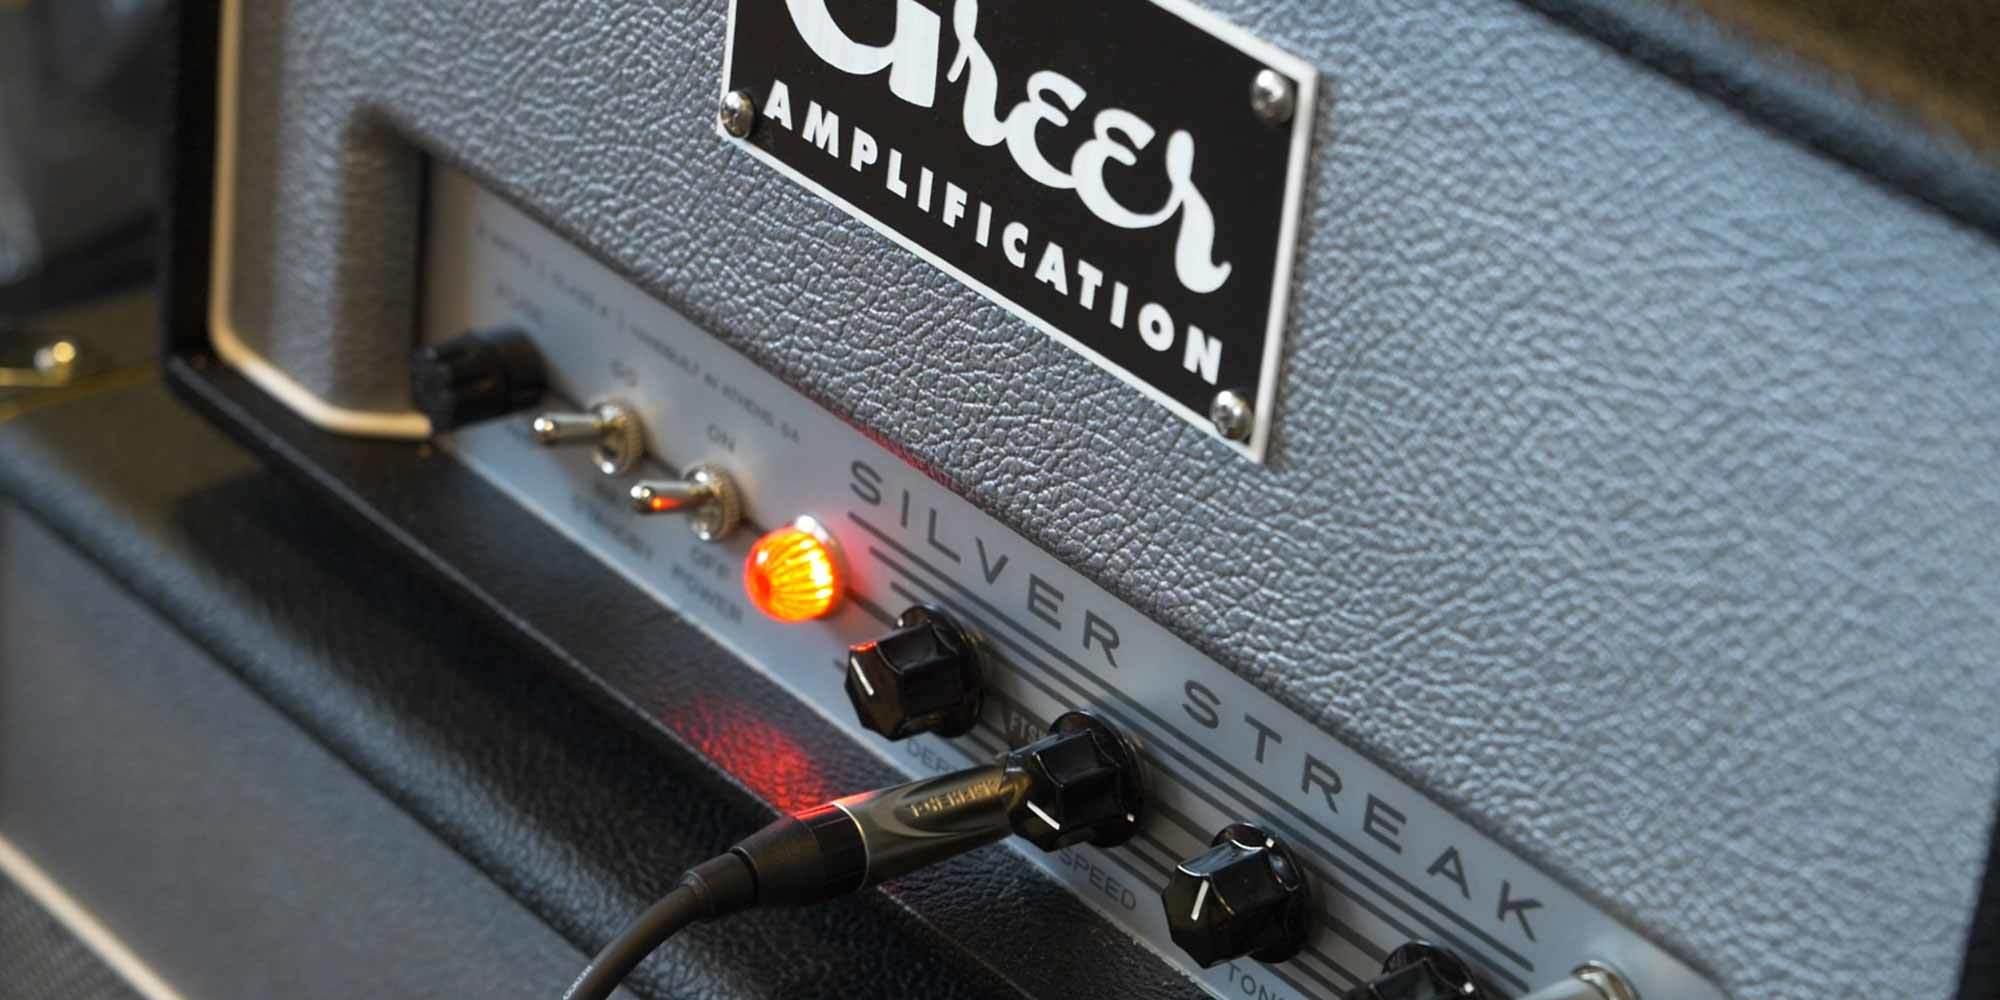 Greer Amps Super Hornet and Silver Streak Amplifier